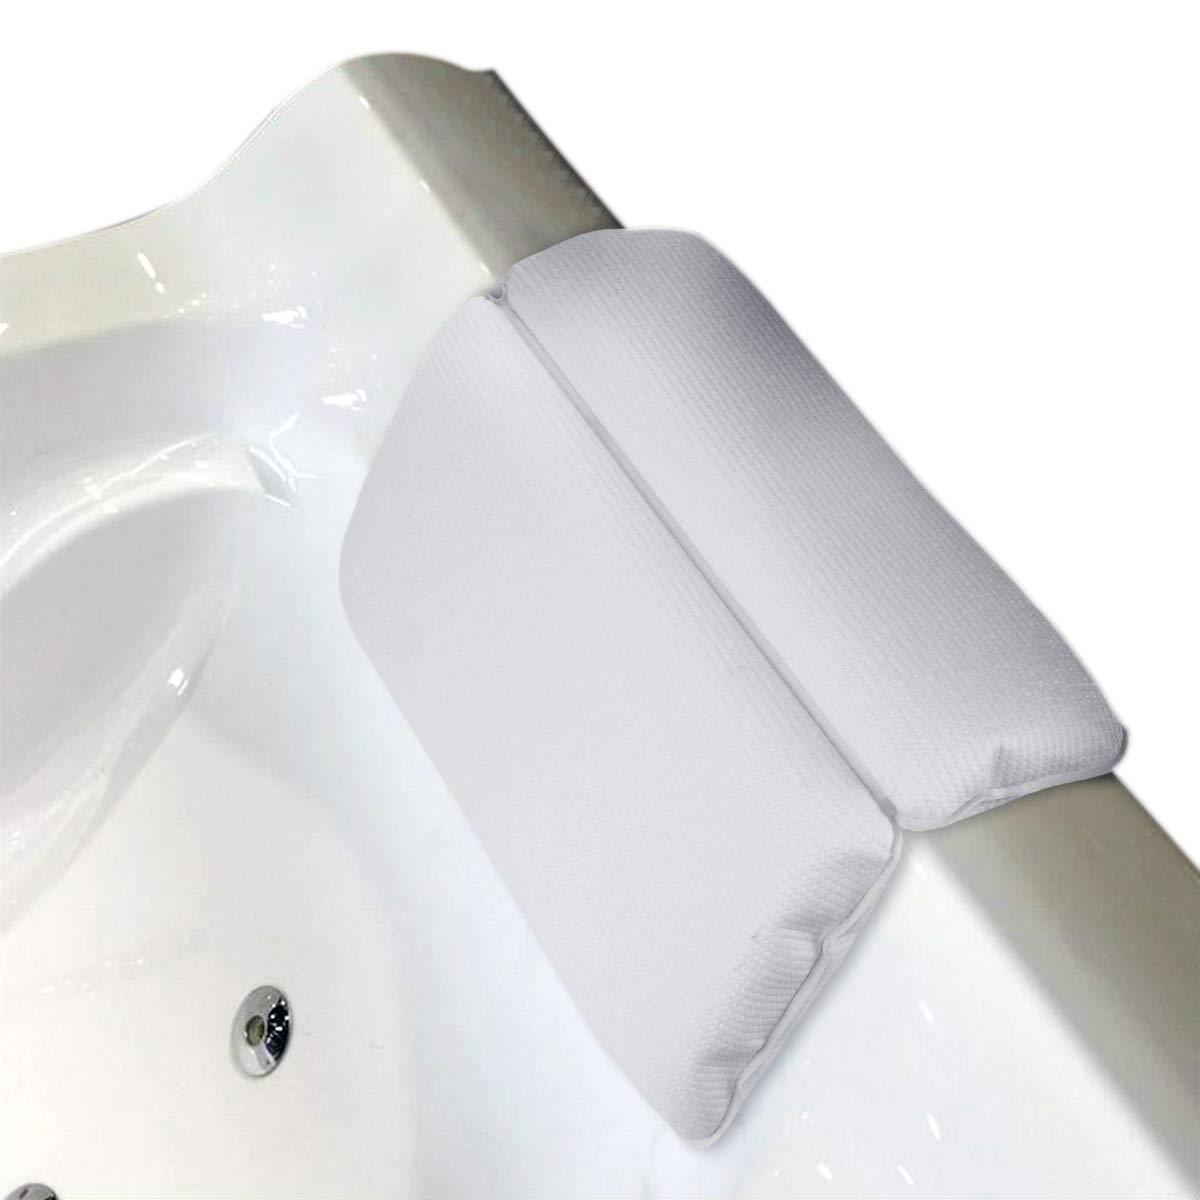 SODIAL Bathroom Bathtub Pillow Bathtub Bath SPA Headrest Waterproof Pillows with Sucker White